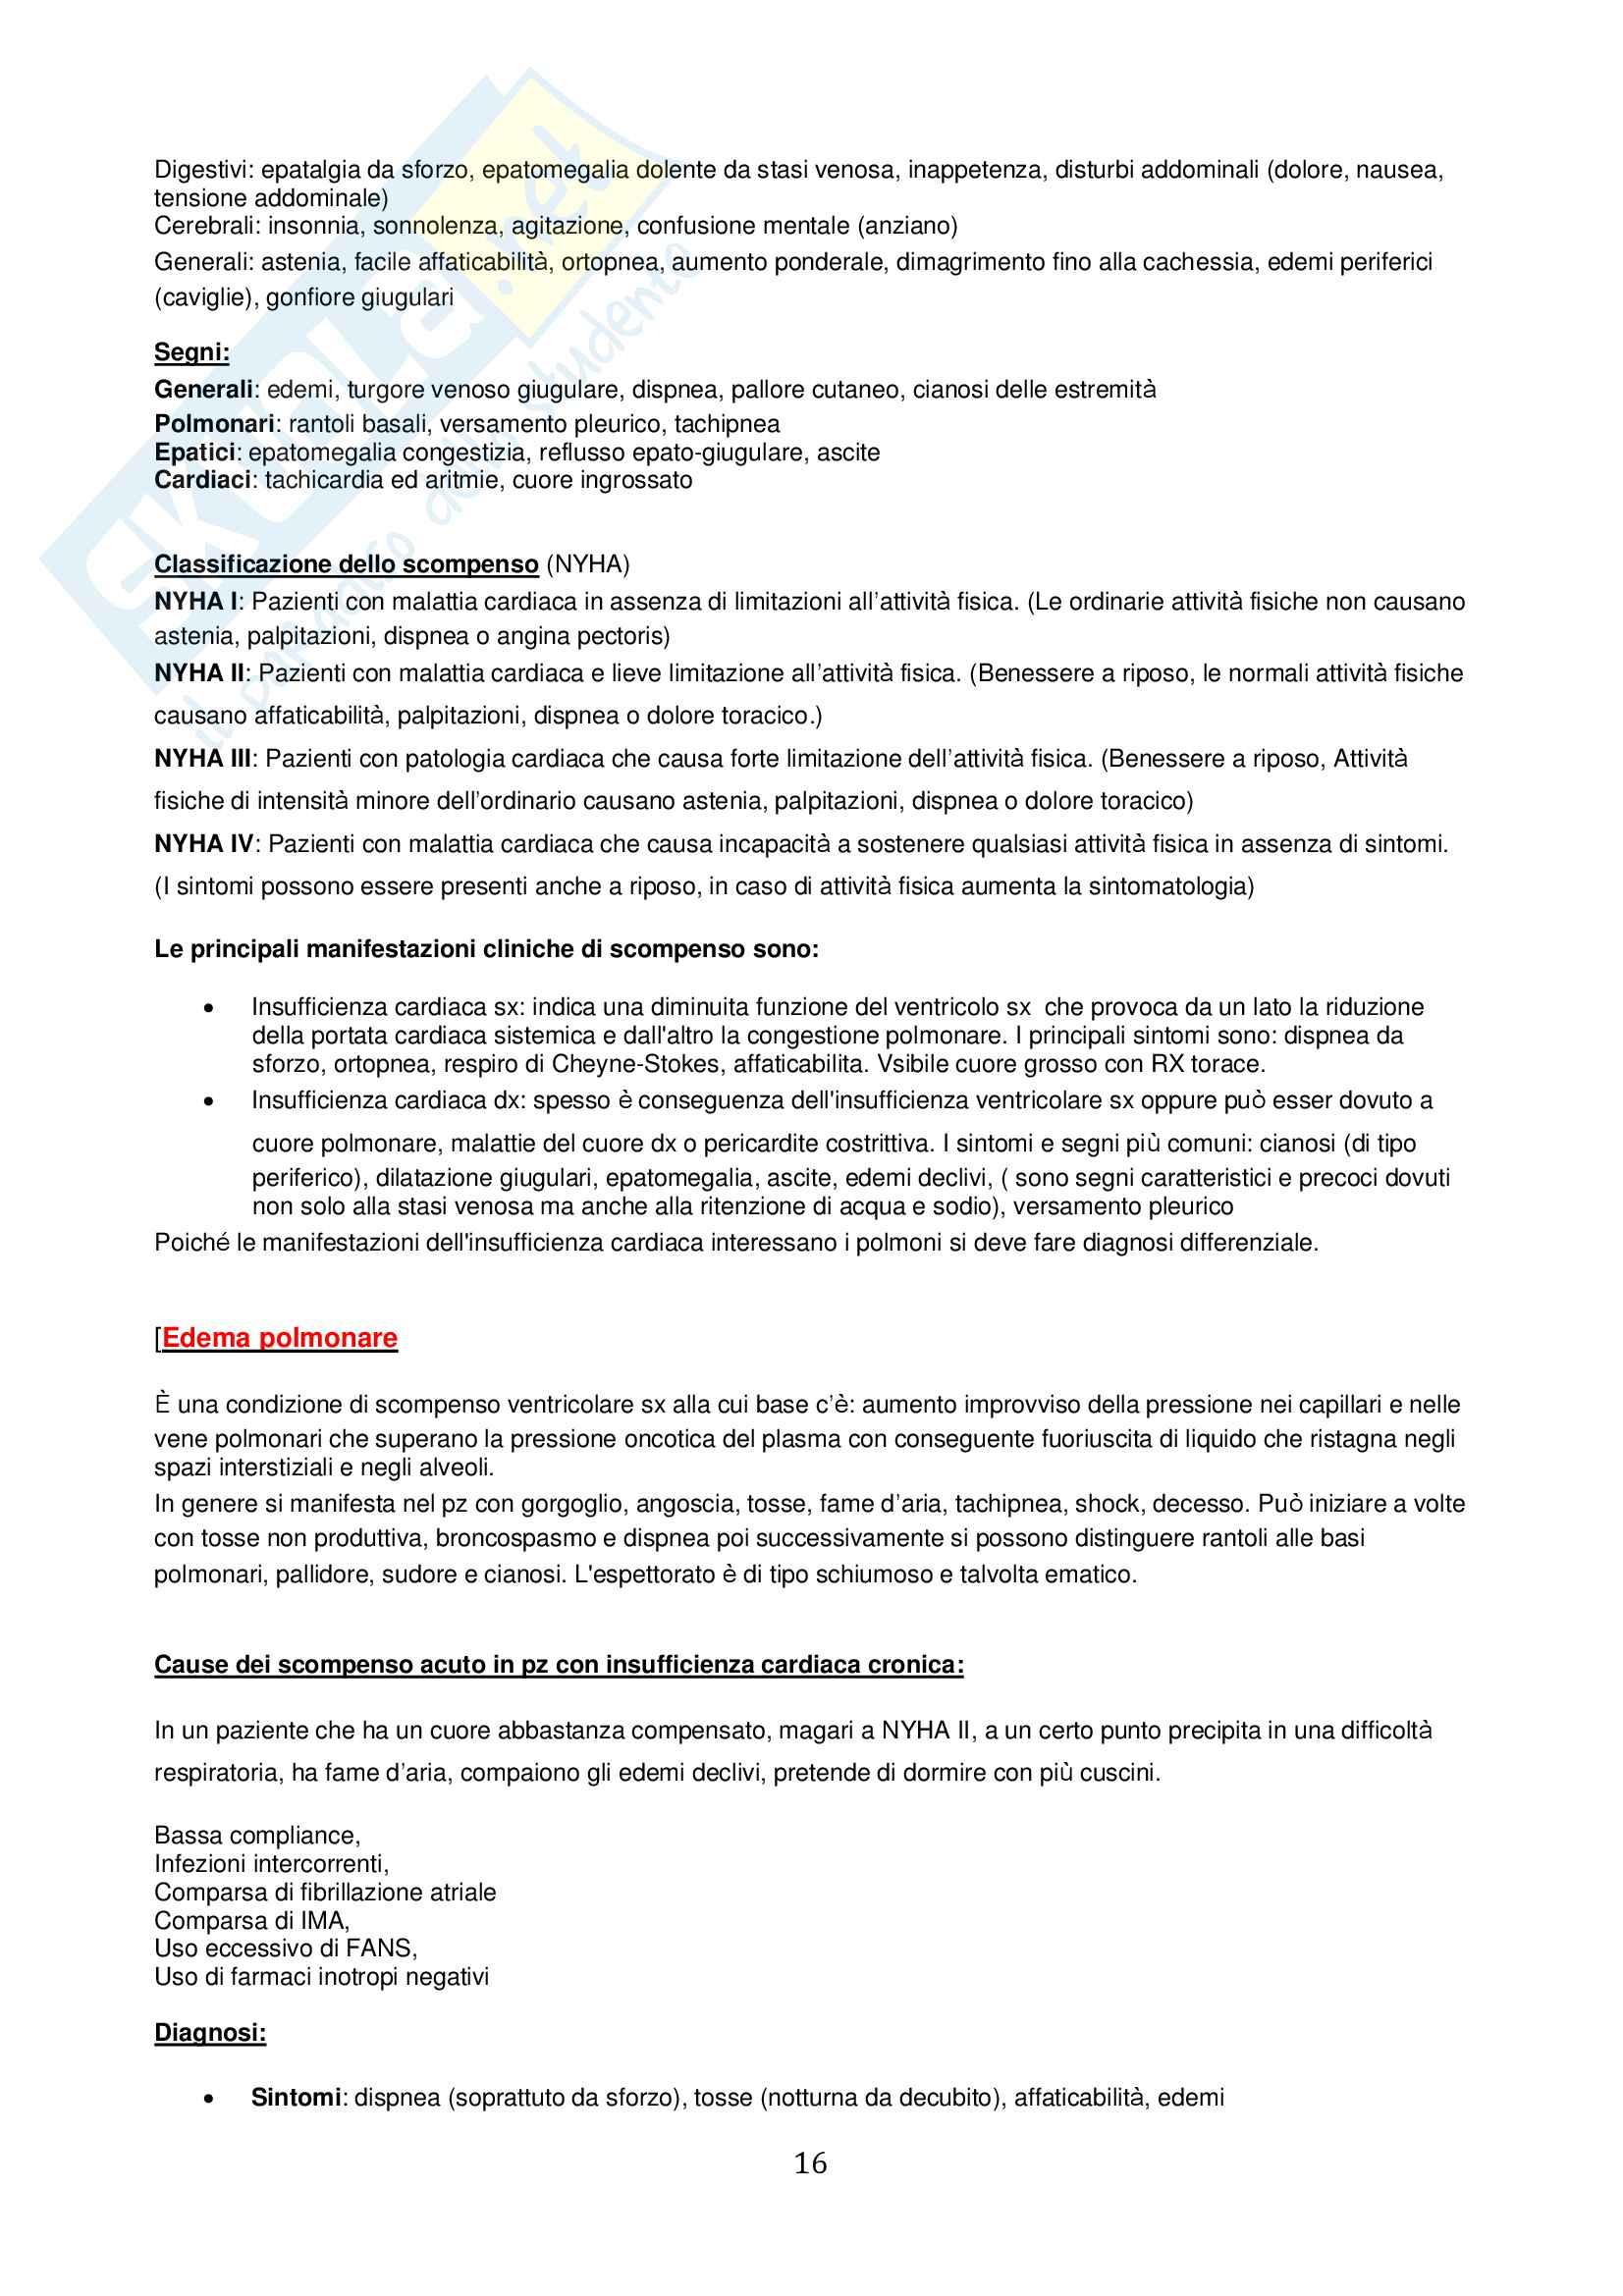 Medicina interna Completo Pag. 16